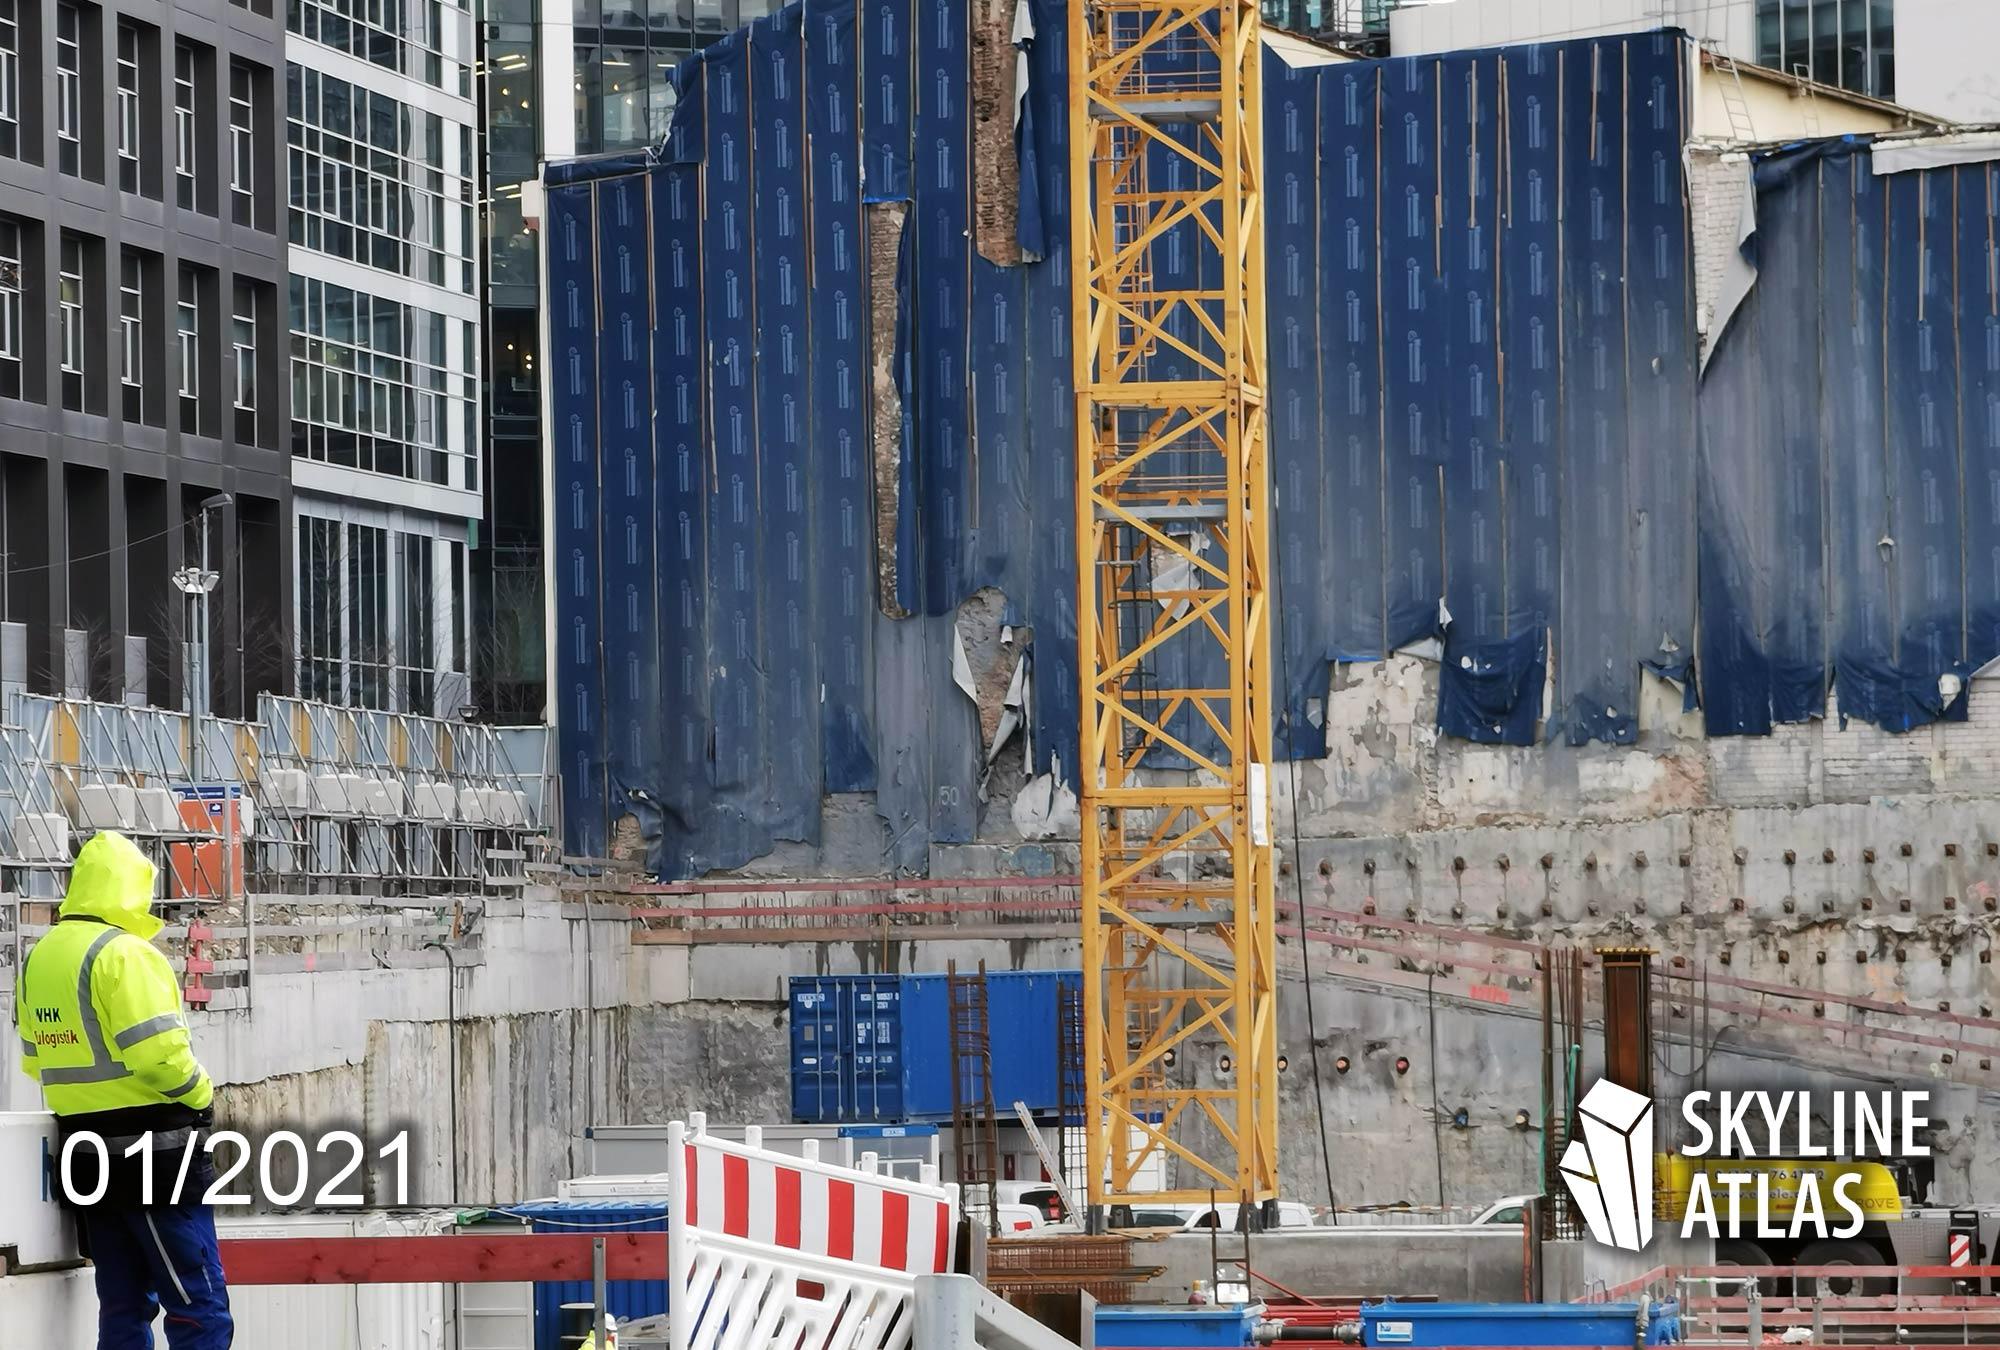 4Frankfurt Baustell - Baufortschritt 4 Frankfurt - Baufortschritt Grundstück Groß & Partner - neues Immobilienprojekt FFM Jan 2021